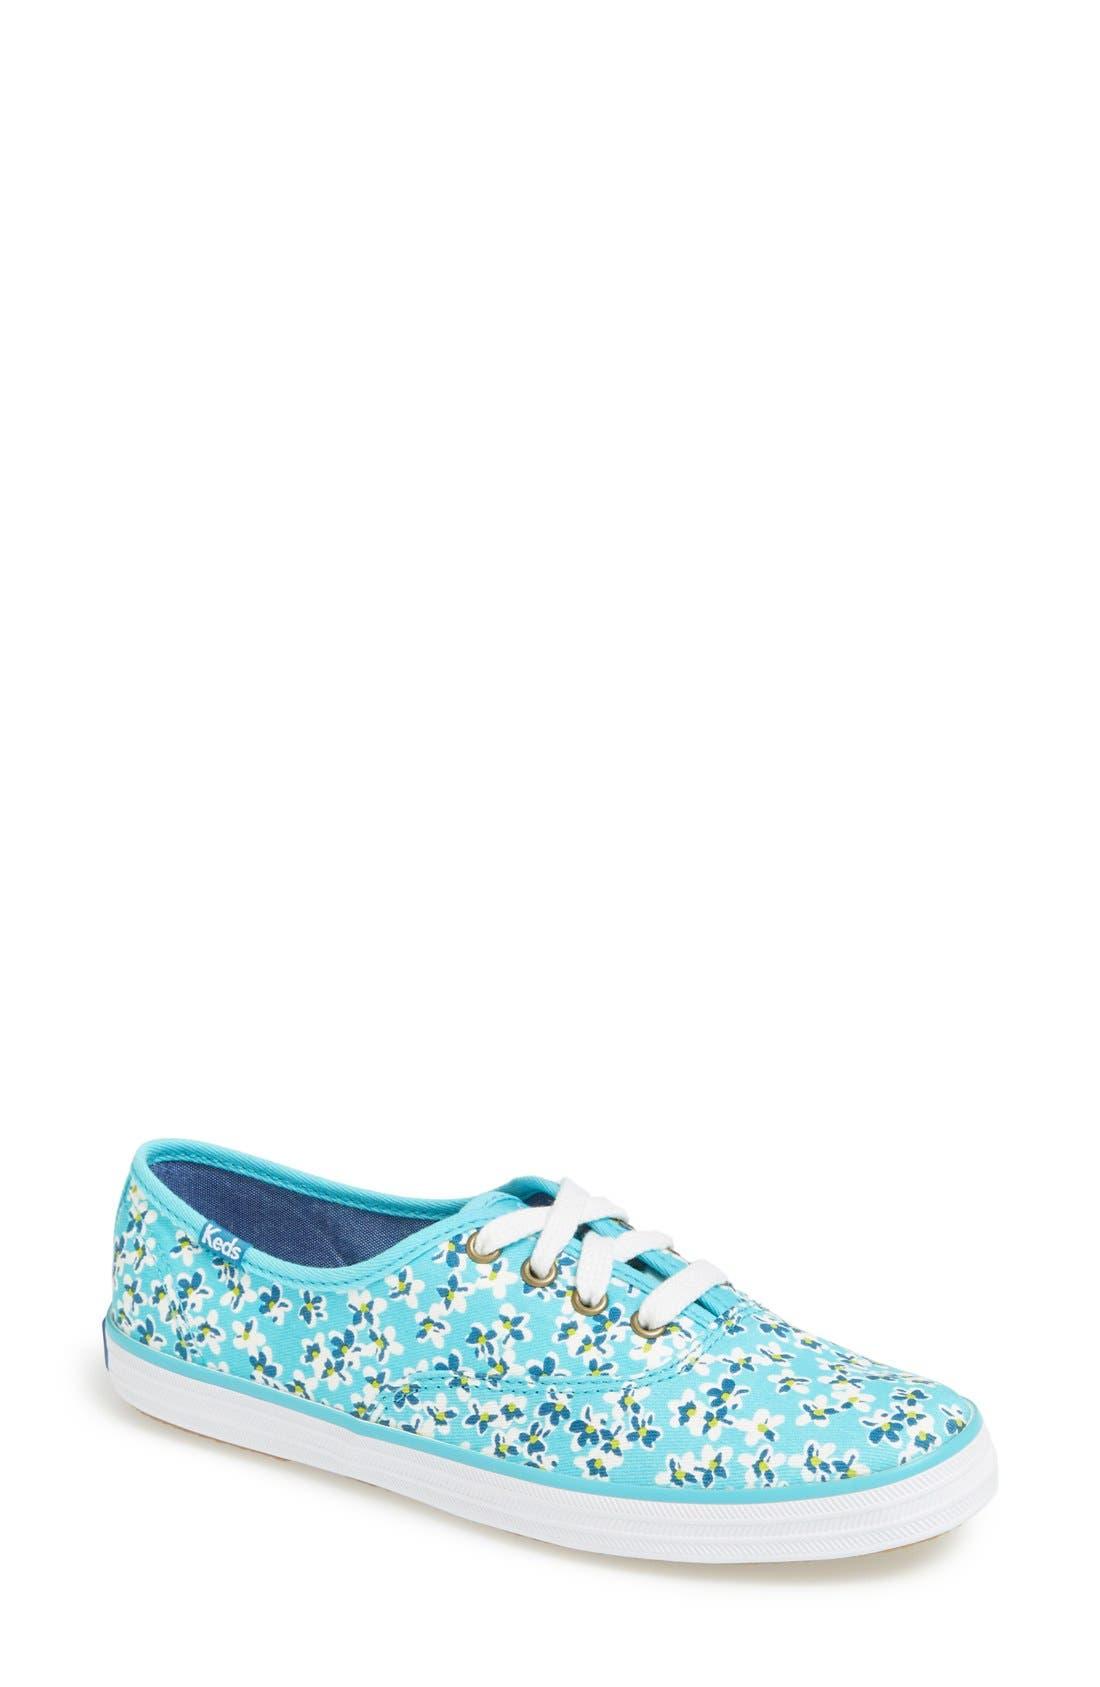 Main Image - Keds® Taylor Swift 'Champion Sunpie Floral' Sneaker (Women)